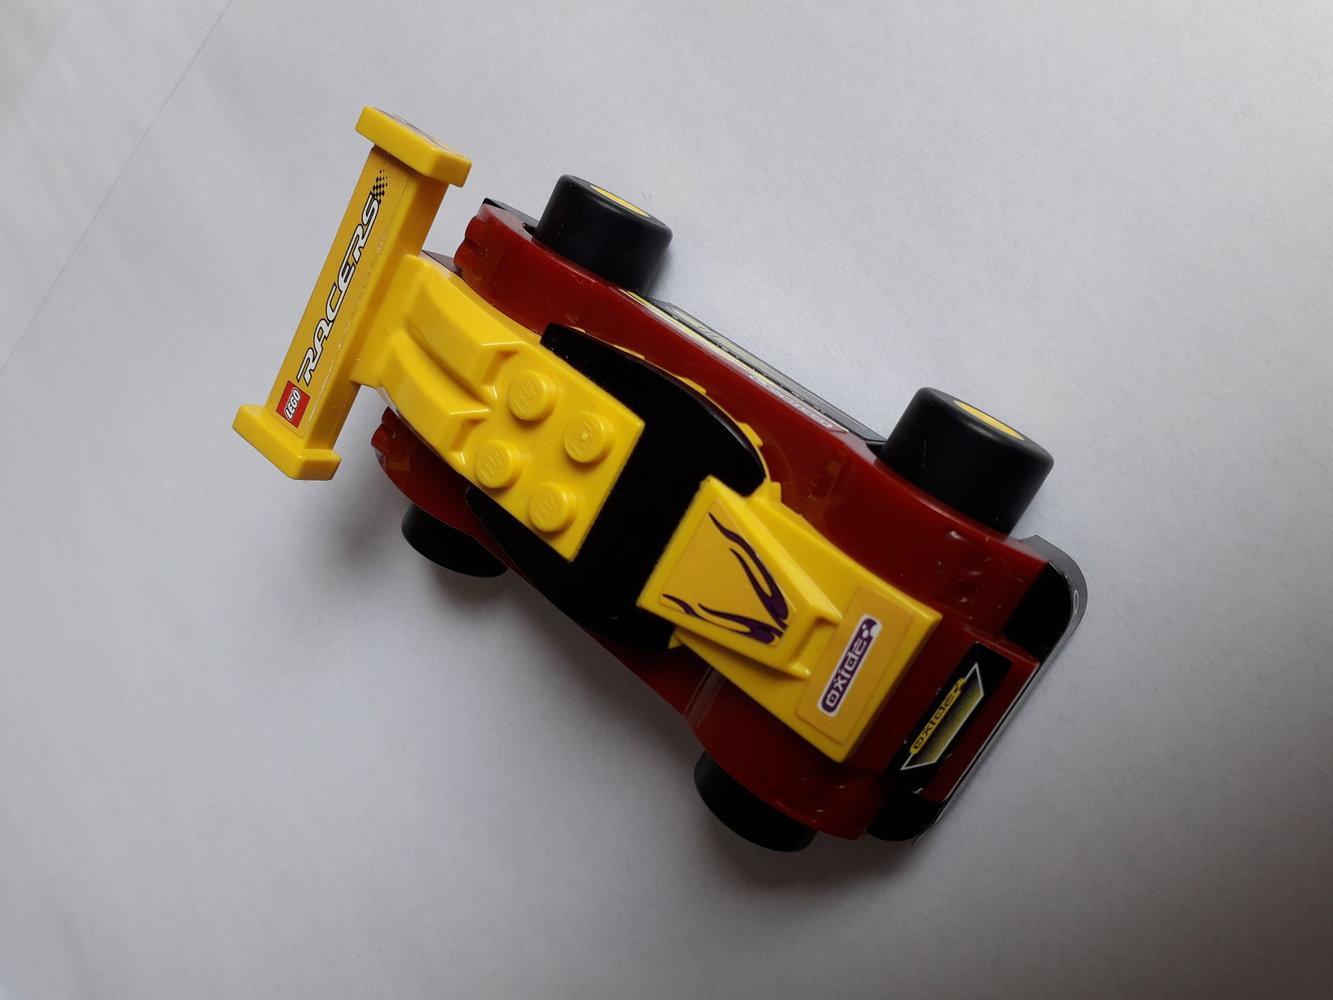 LegoMcDonald's Racers Car 4 - Sportpfeil (EU)